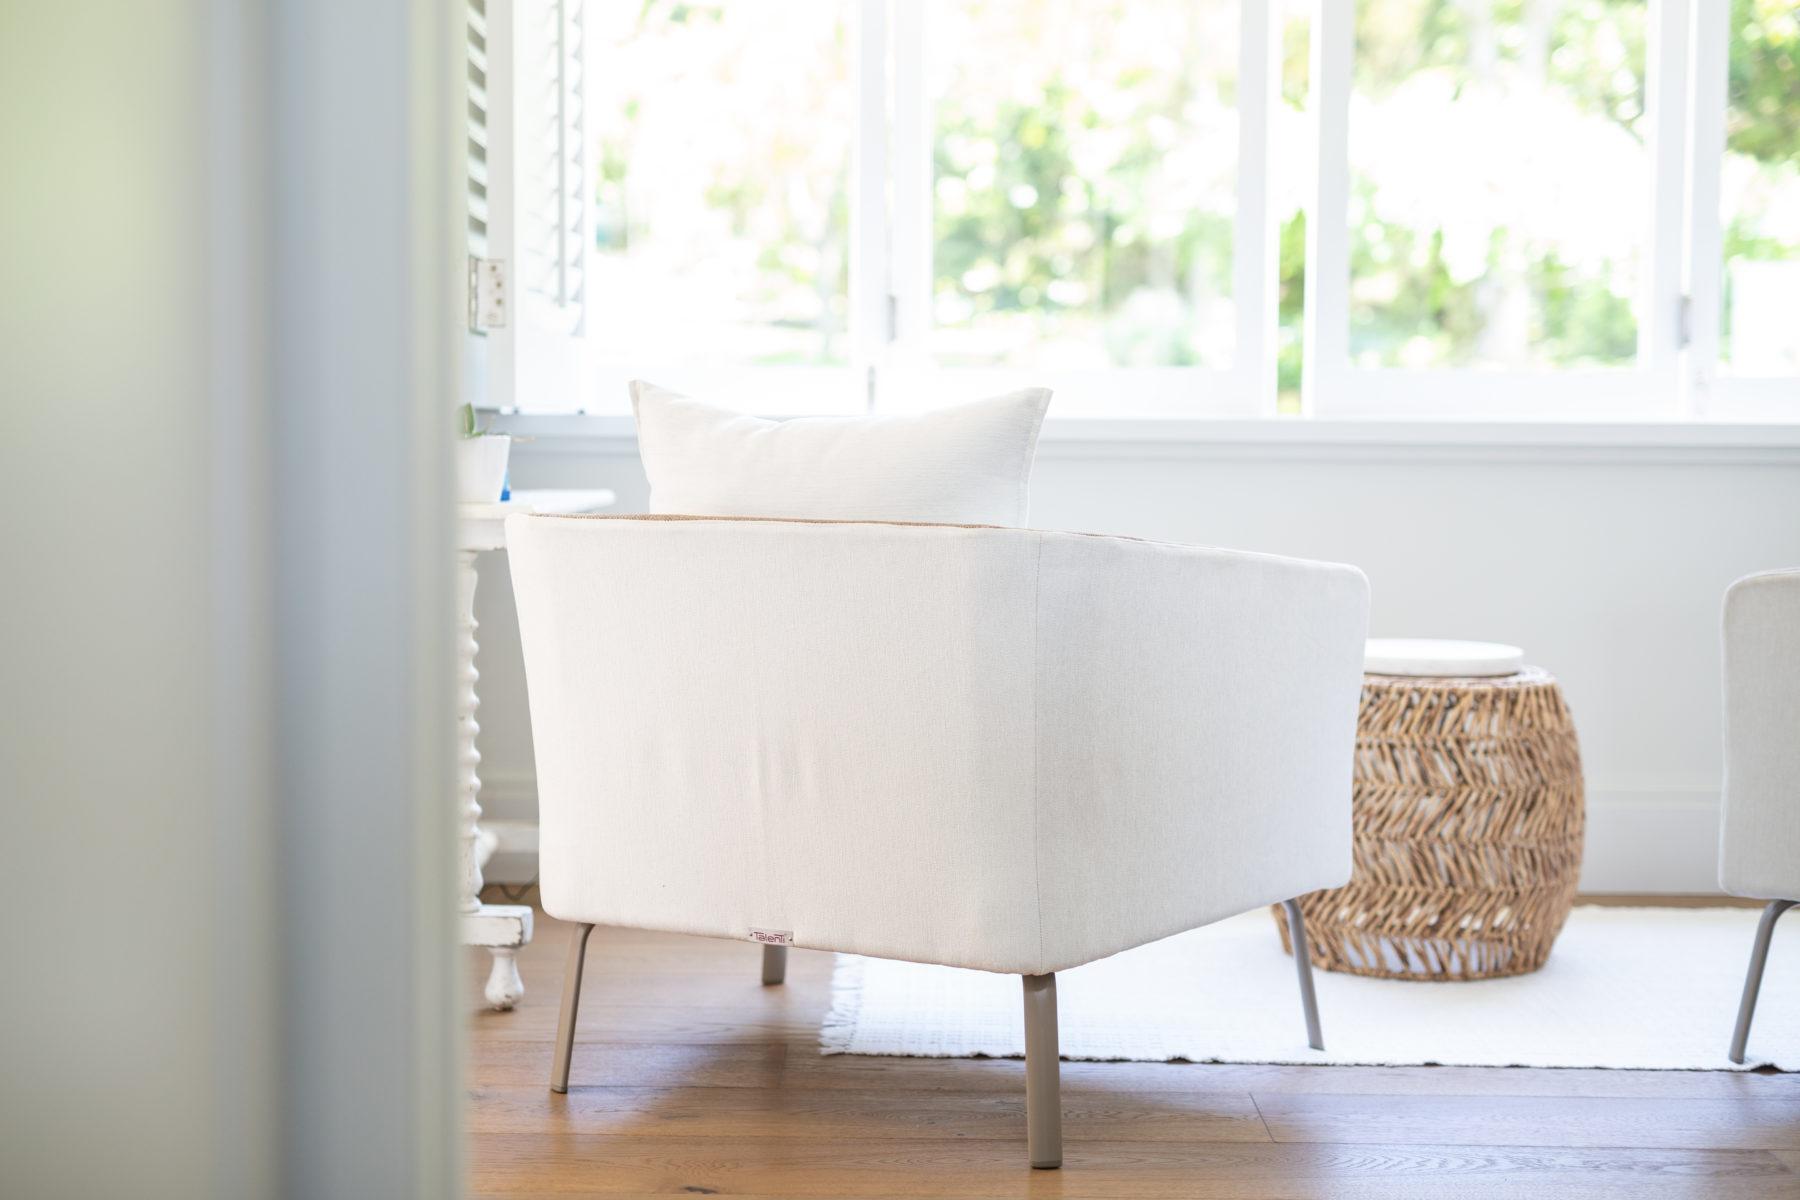 custom white chair with rattan side table and wood flooring modern beach feel